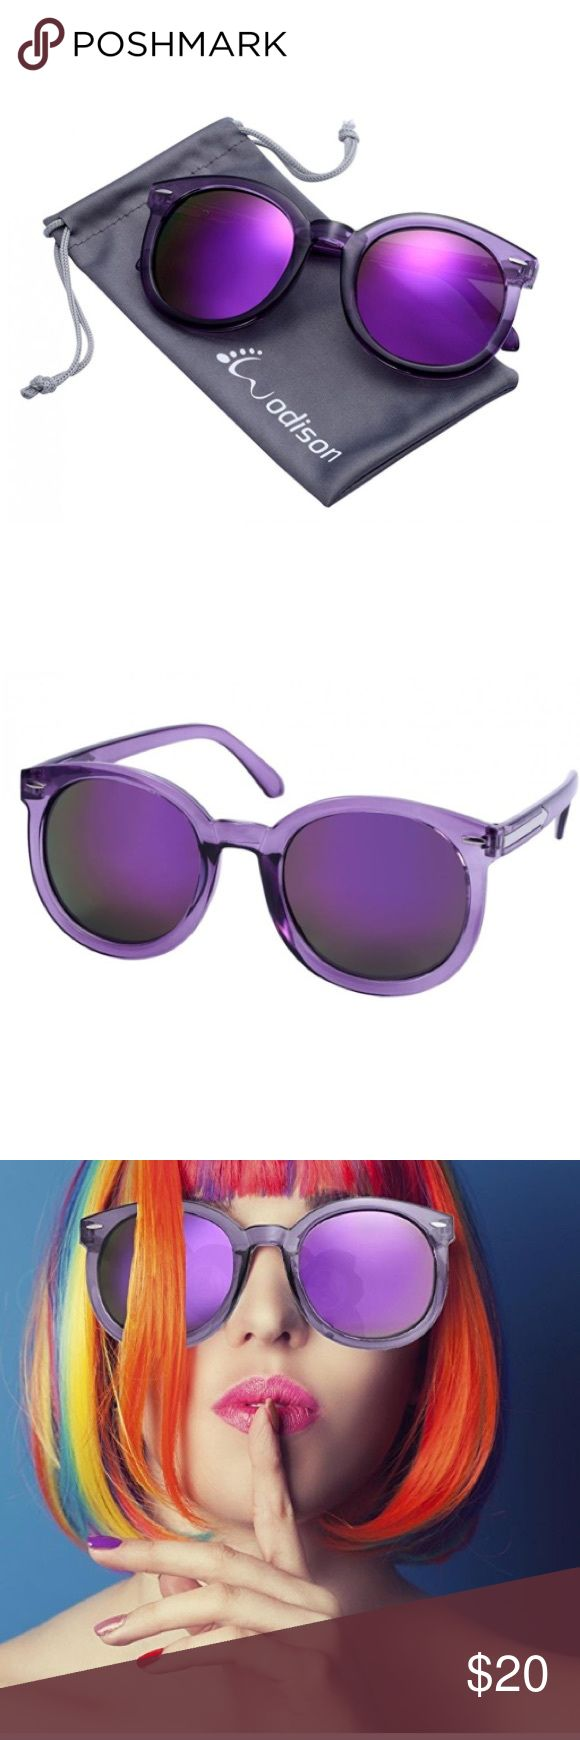 5ca3136bc9ae199b8fb8cb7c83d2cf5d  mirrored sunglasses purple Best Of Blaugrünes Und Graues Schlafzimmer Zat3